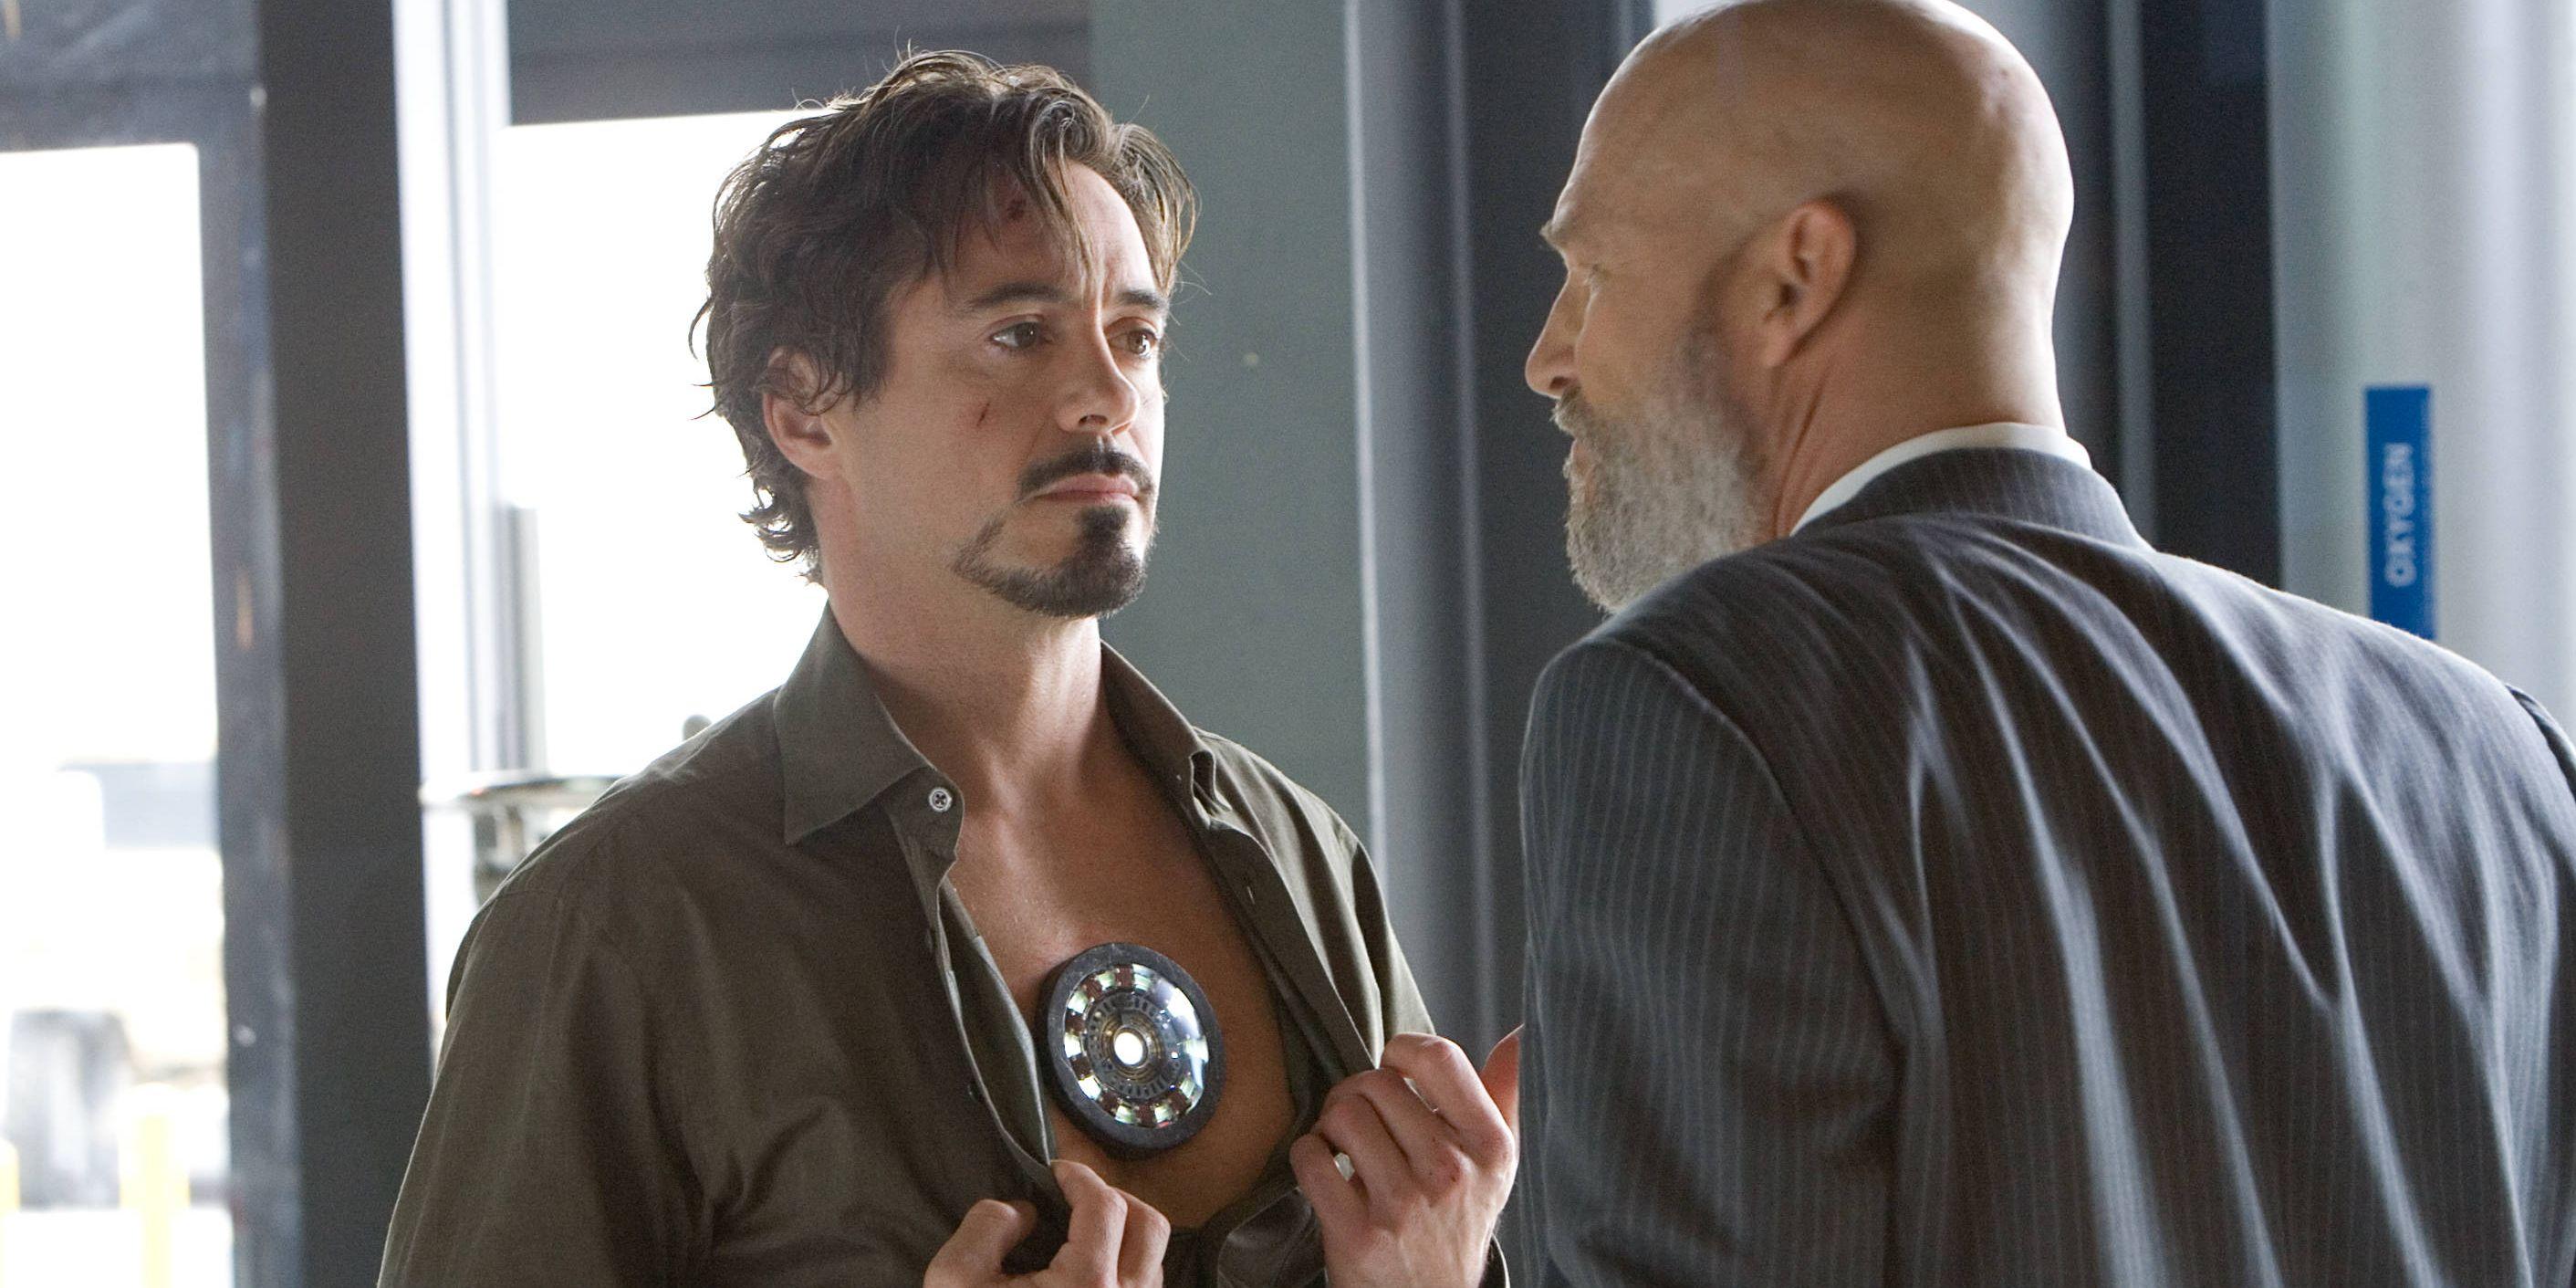 Robert Downey Jr and Jeff Bridges in Iron Man